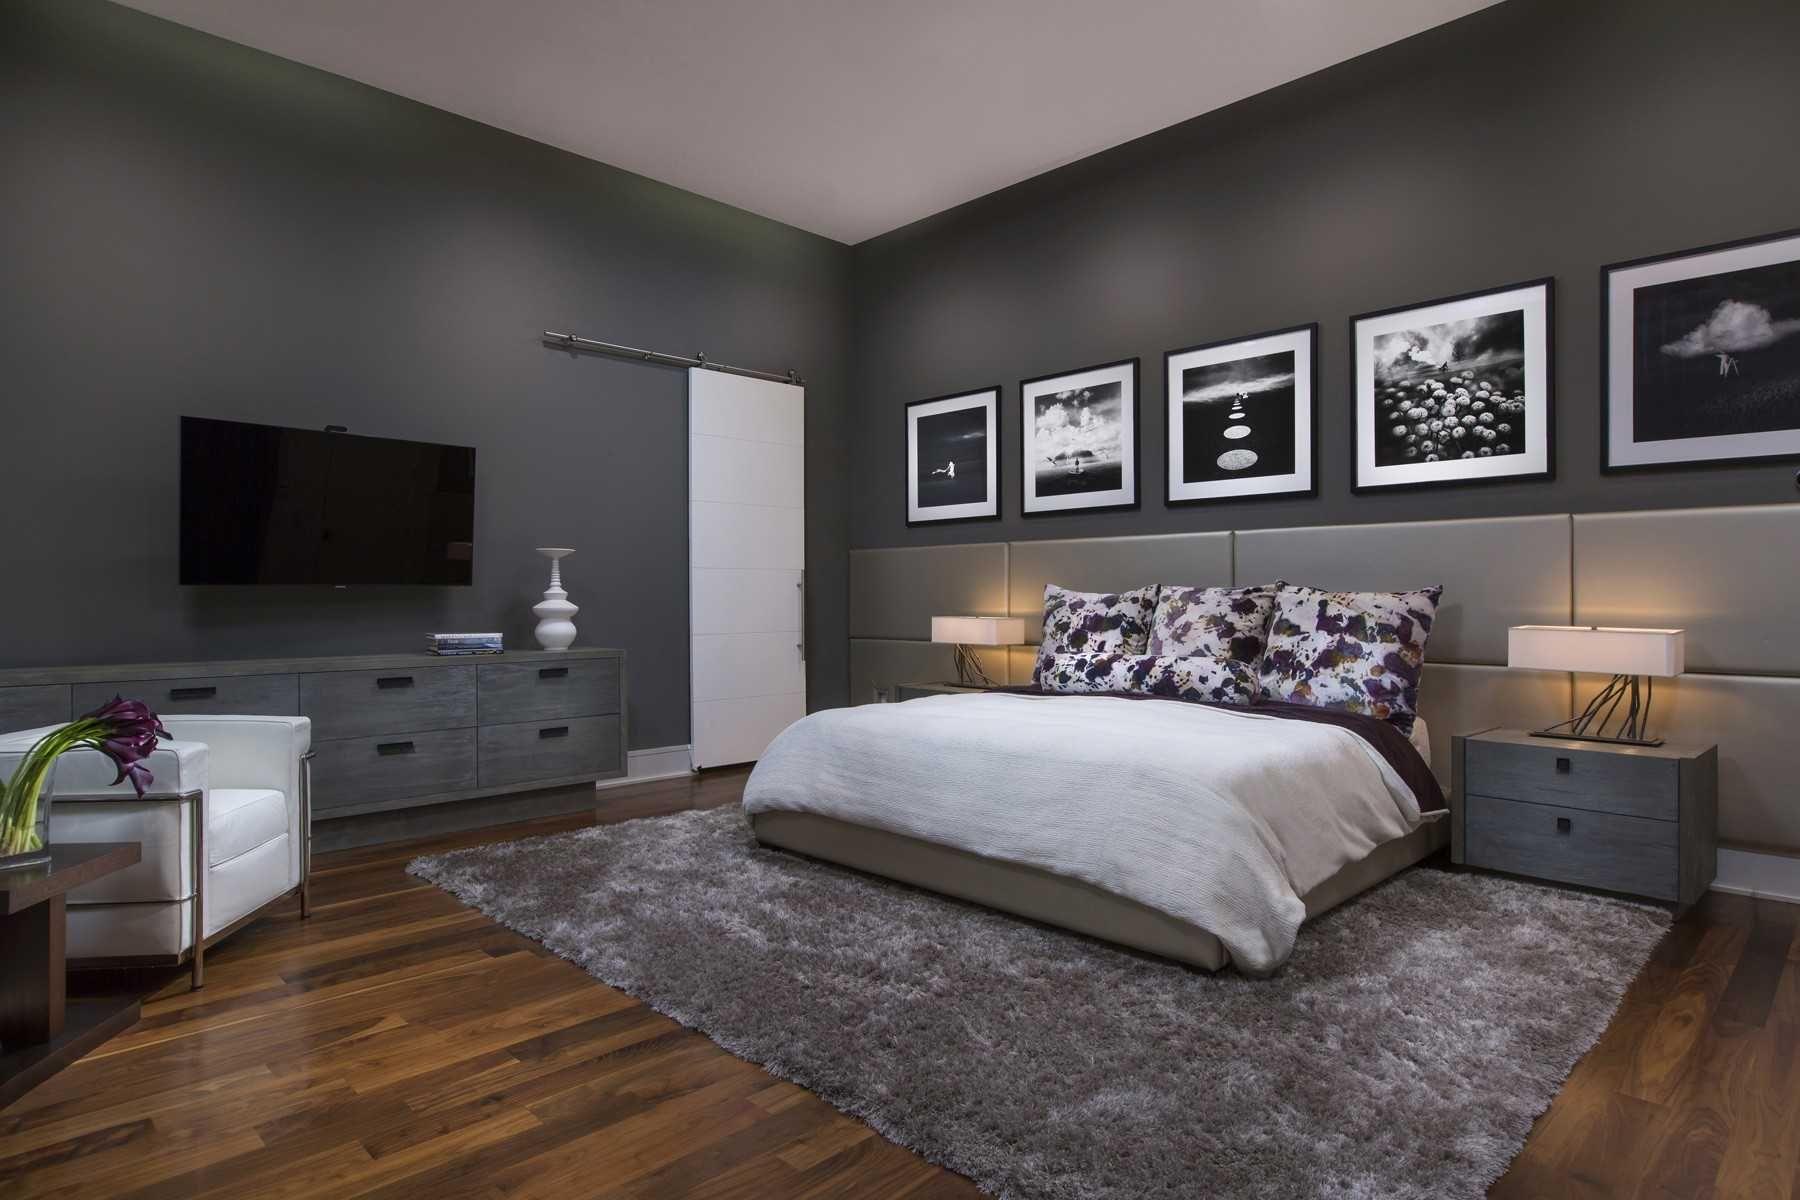 احدث الوان غرف نوم مودرن 2019 modern bedrooms 2020 on interior house color ideas id=44848